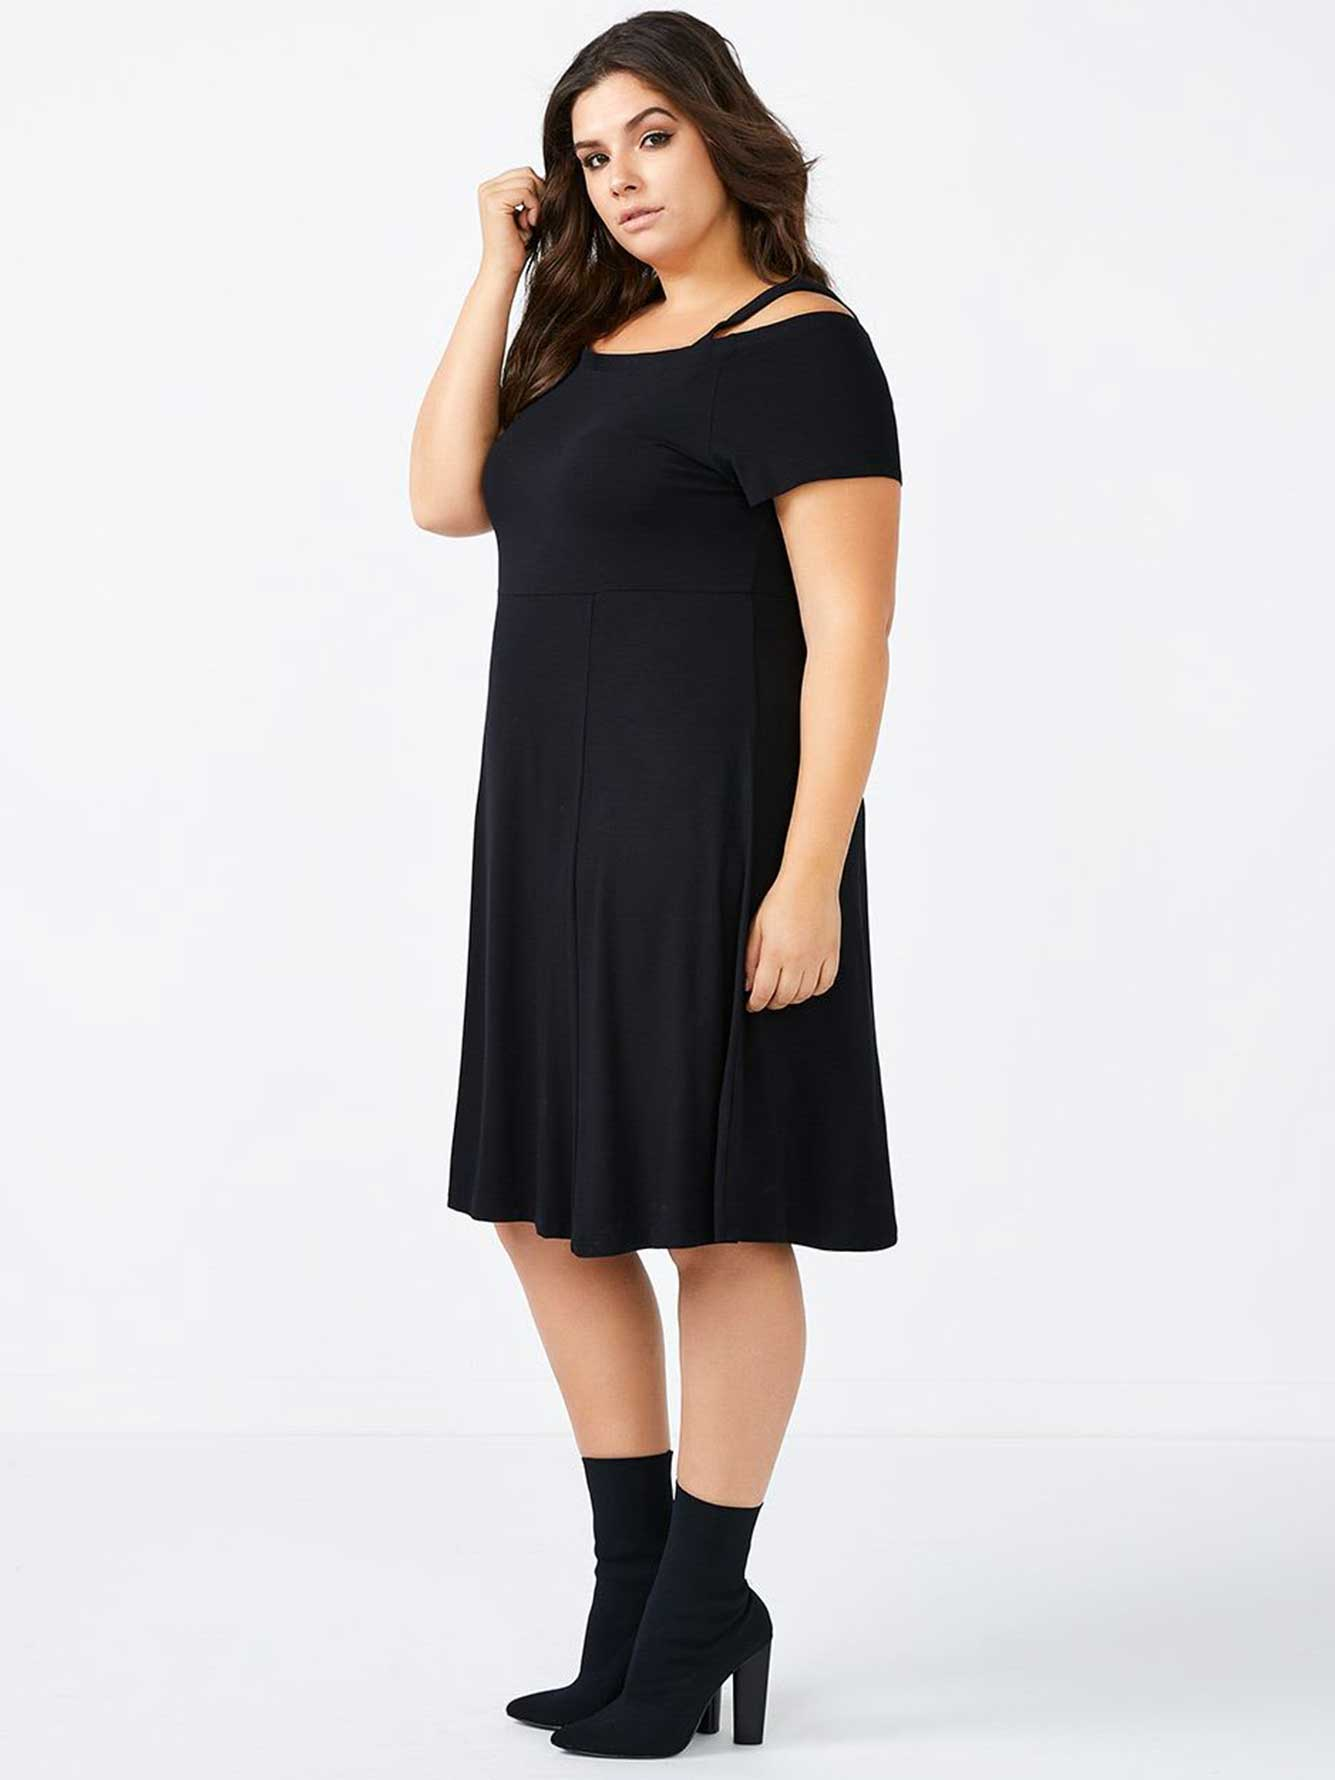 9a0c7beab3 Off Shoulder Fit and Flare Black Dress | Penningtons